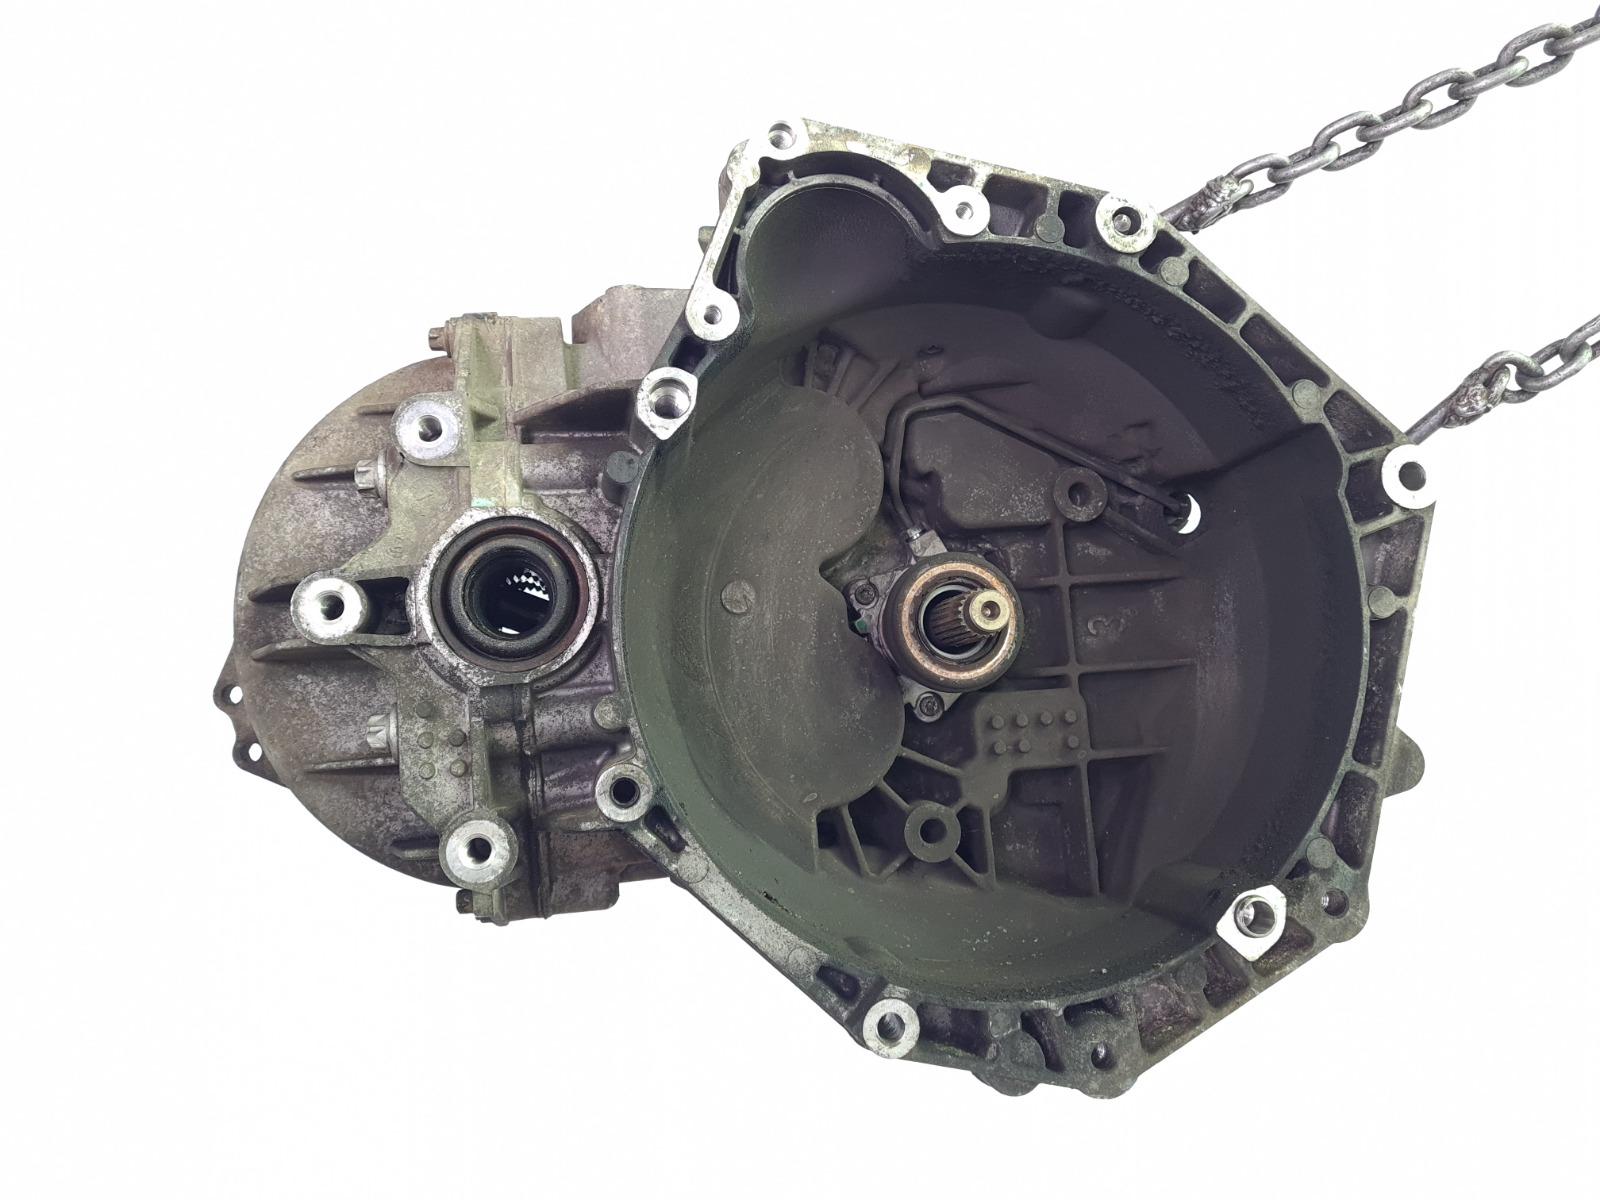 Кпп механическая (мкпп) Opel Zafira B 1.9 CDTI 2007 (б/у)